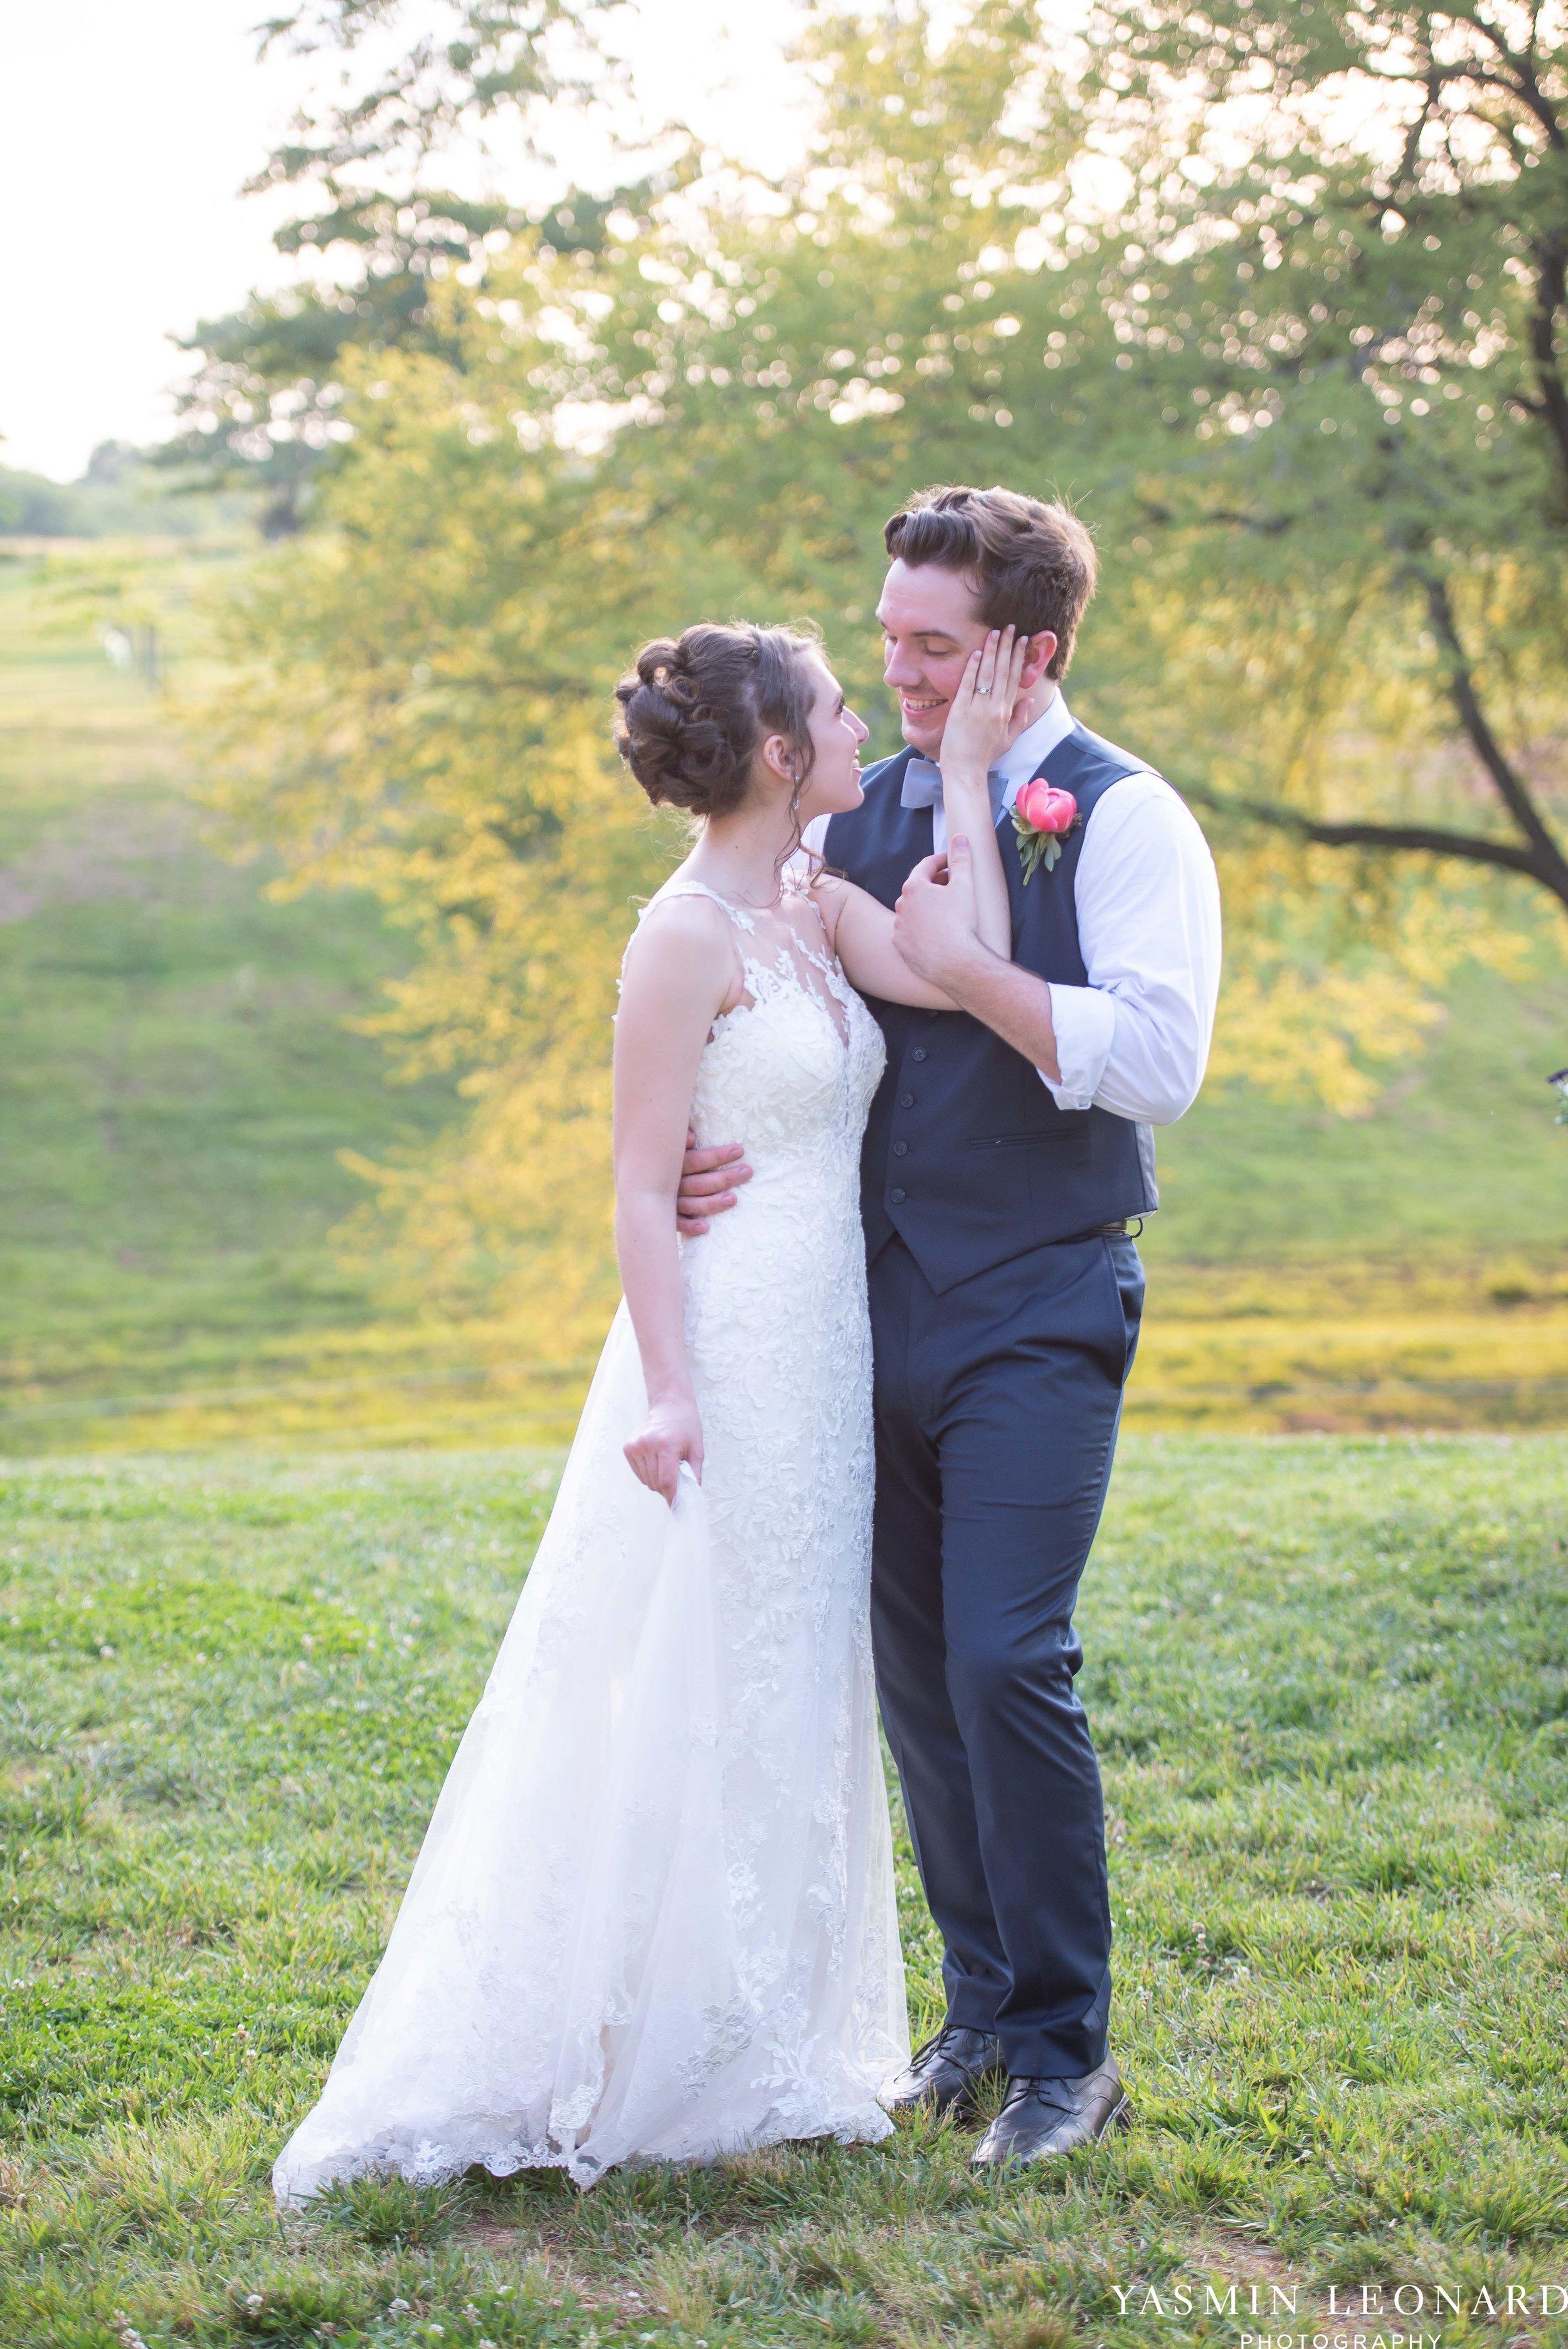 Old Homeplace Vineyard - NC Weddings - Outdoor Summer Weddings - Peony Boutique - Vineyard Wedding - NC Photographer - Yasmin Leonard Photography-55.jpg